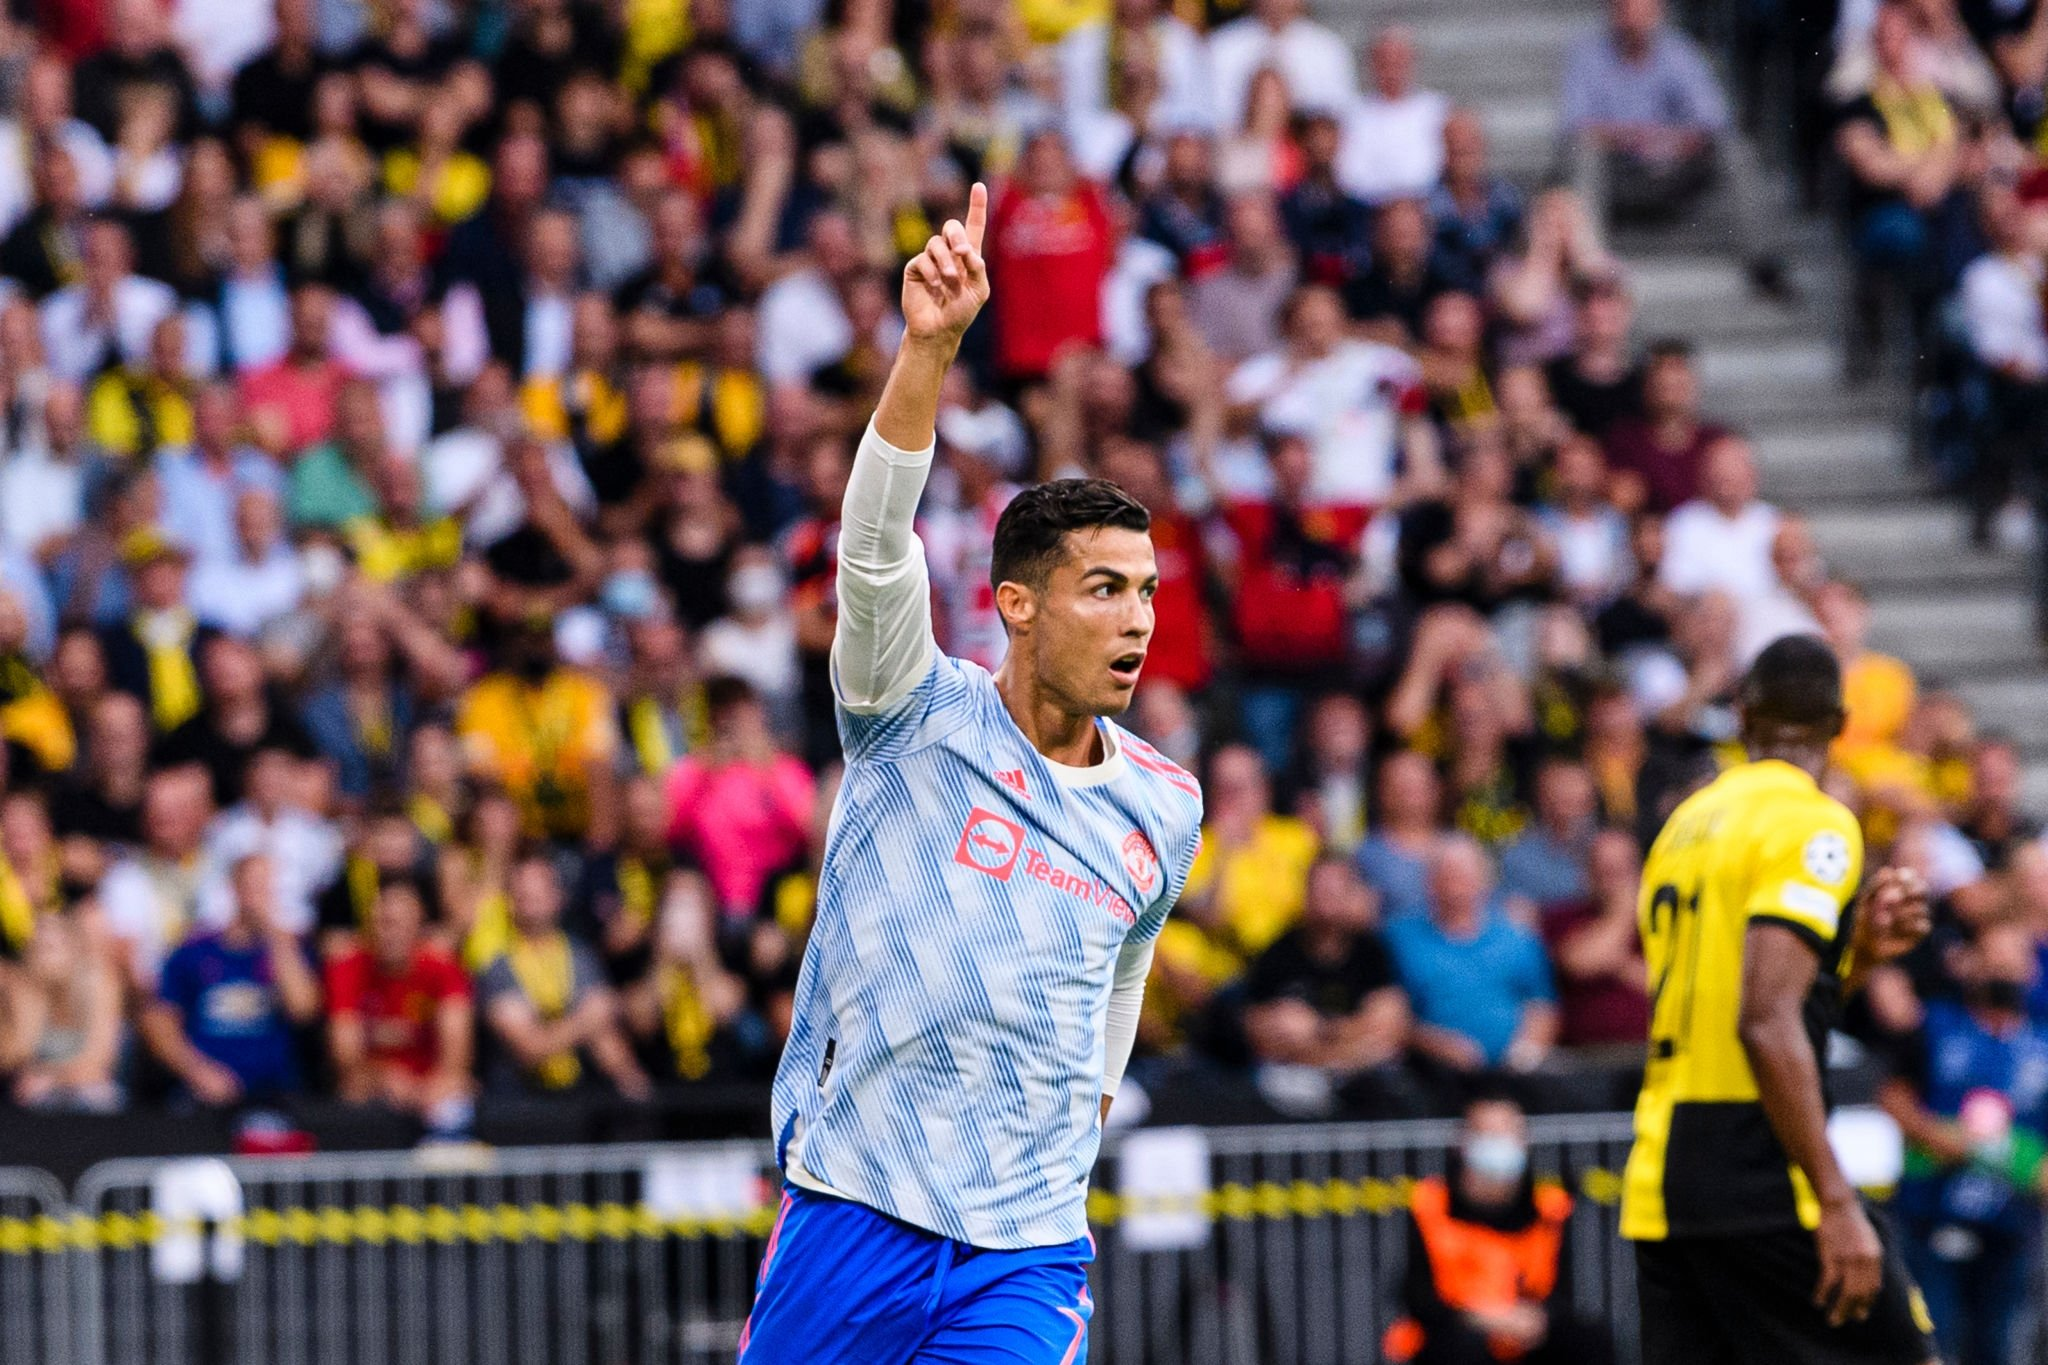 هدف رونالدو مانشستر يونايتد, هدف كريستيانو رونالدو, كريستيانو رونالدو يسجل هدف مانشستر يونايتد, goal ronaldo, goal Cristiano ronaldo